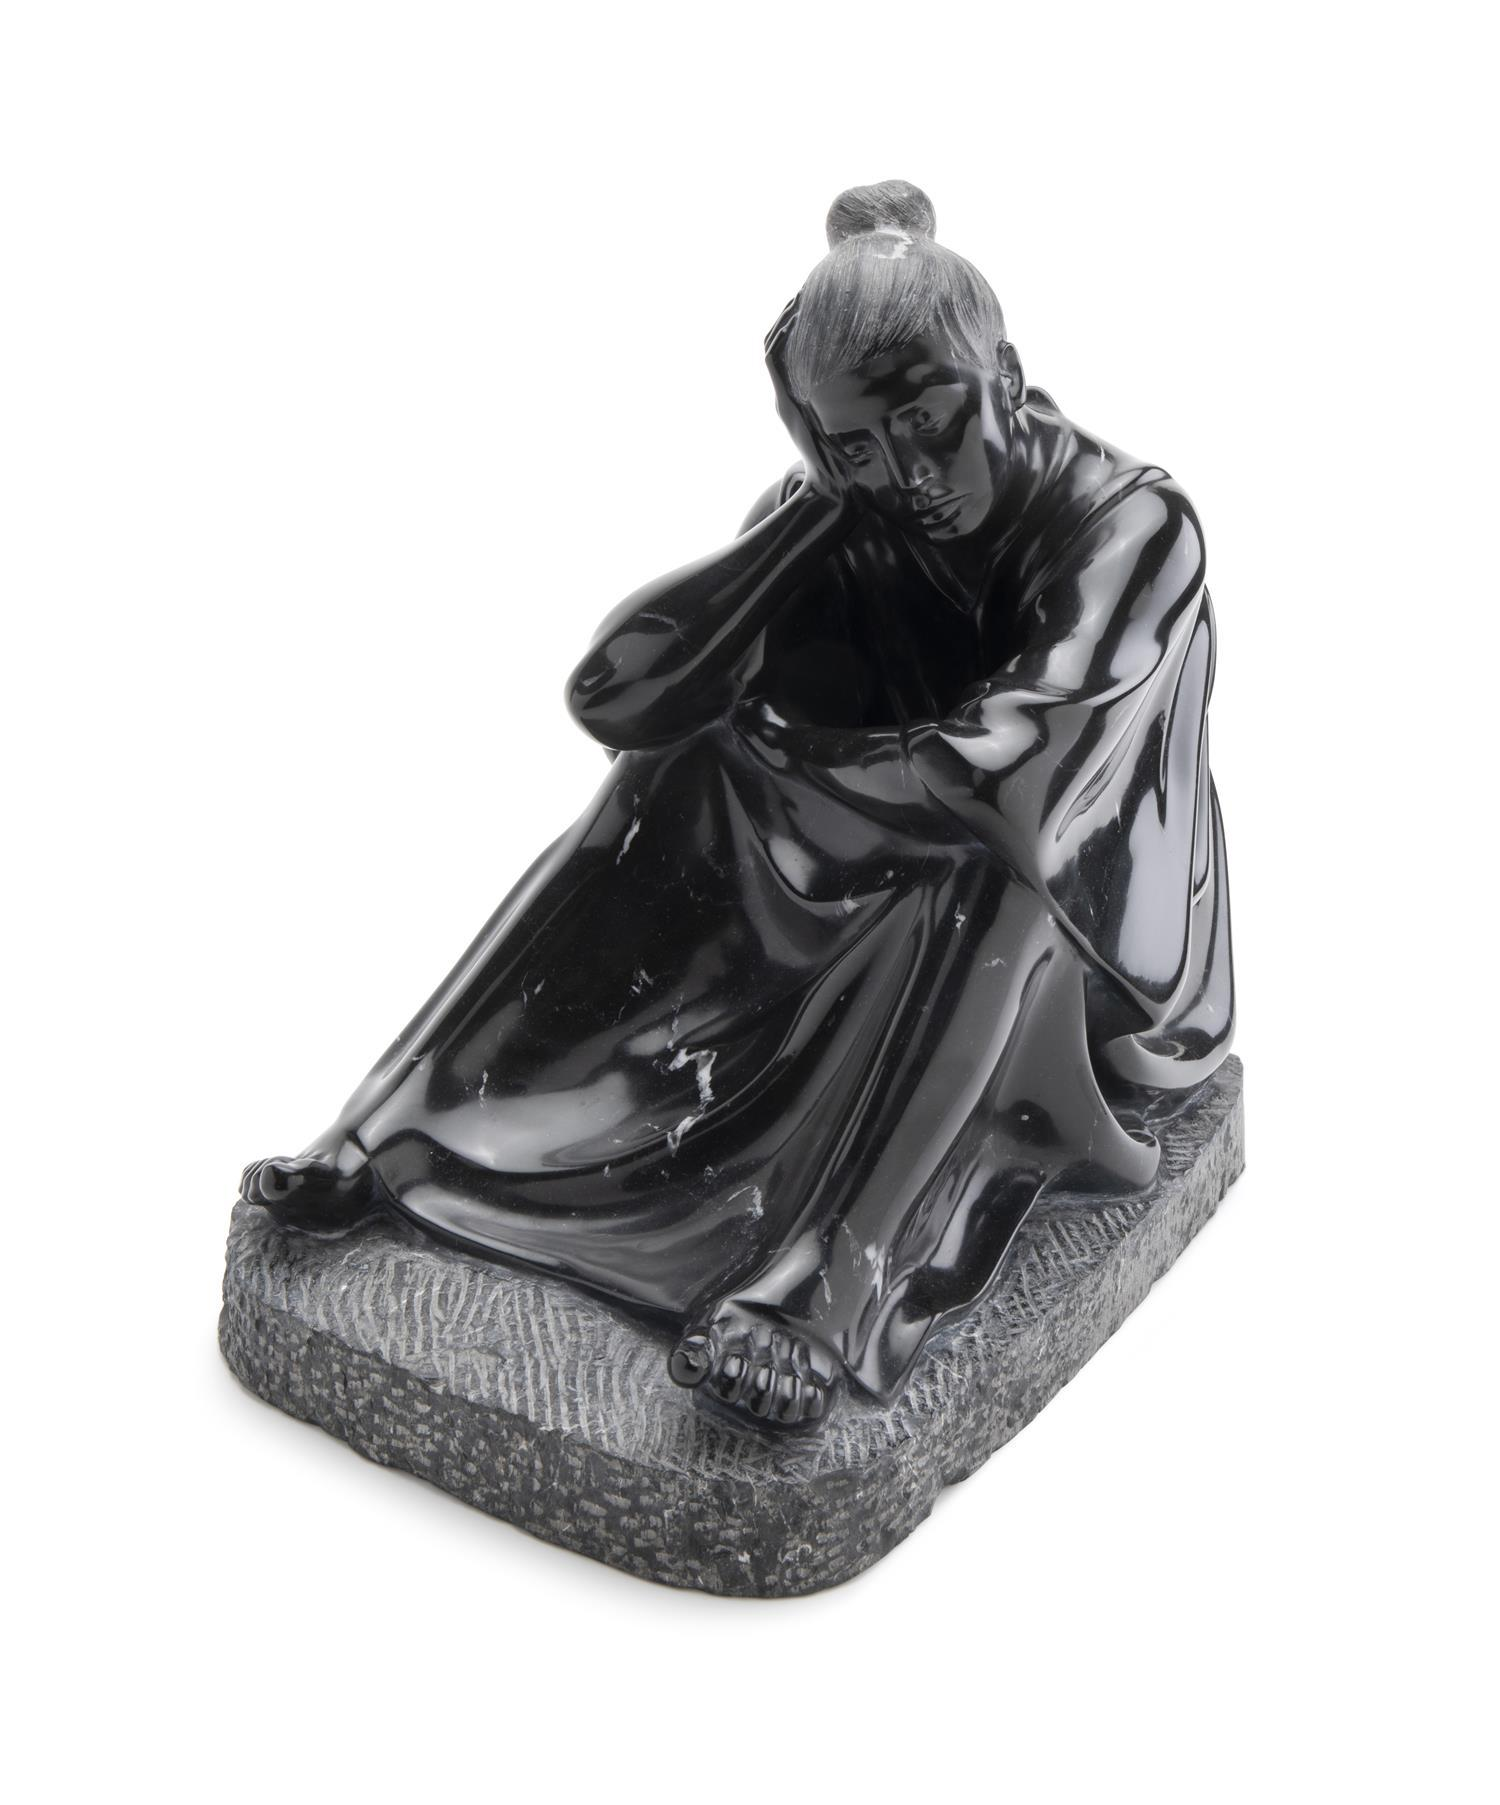 "Felipe Castañeda, (b. 1933, Mexican), ""Mujer en Reposo,"" 1982, Carved black marble, 15"" H x 10.5"" W x 16"" D"